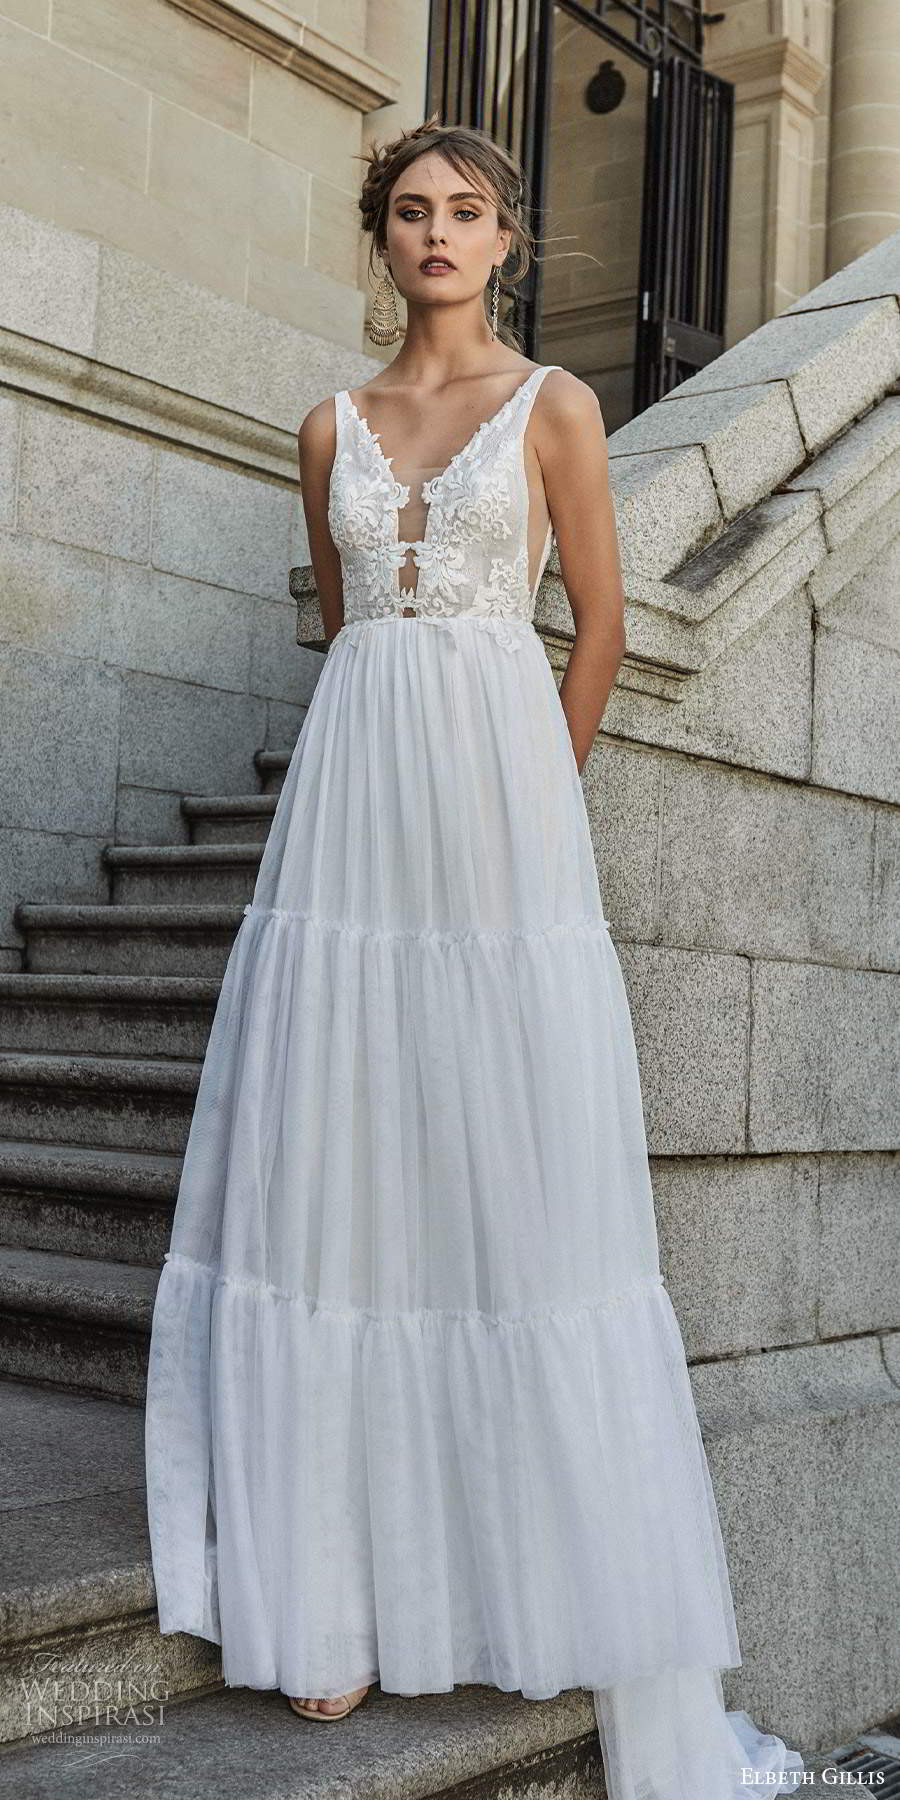 elbeth gillis 2021 bridal sleeveless straps plunging v neckline embellished bodice a line ball gown wedding dress chapel train (9) mv